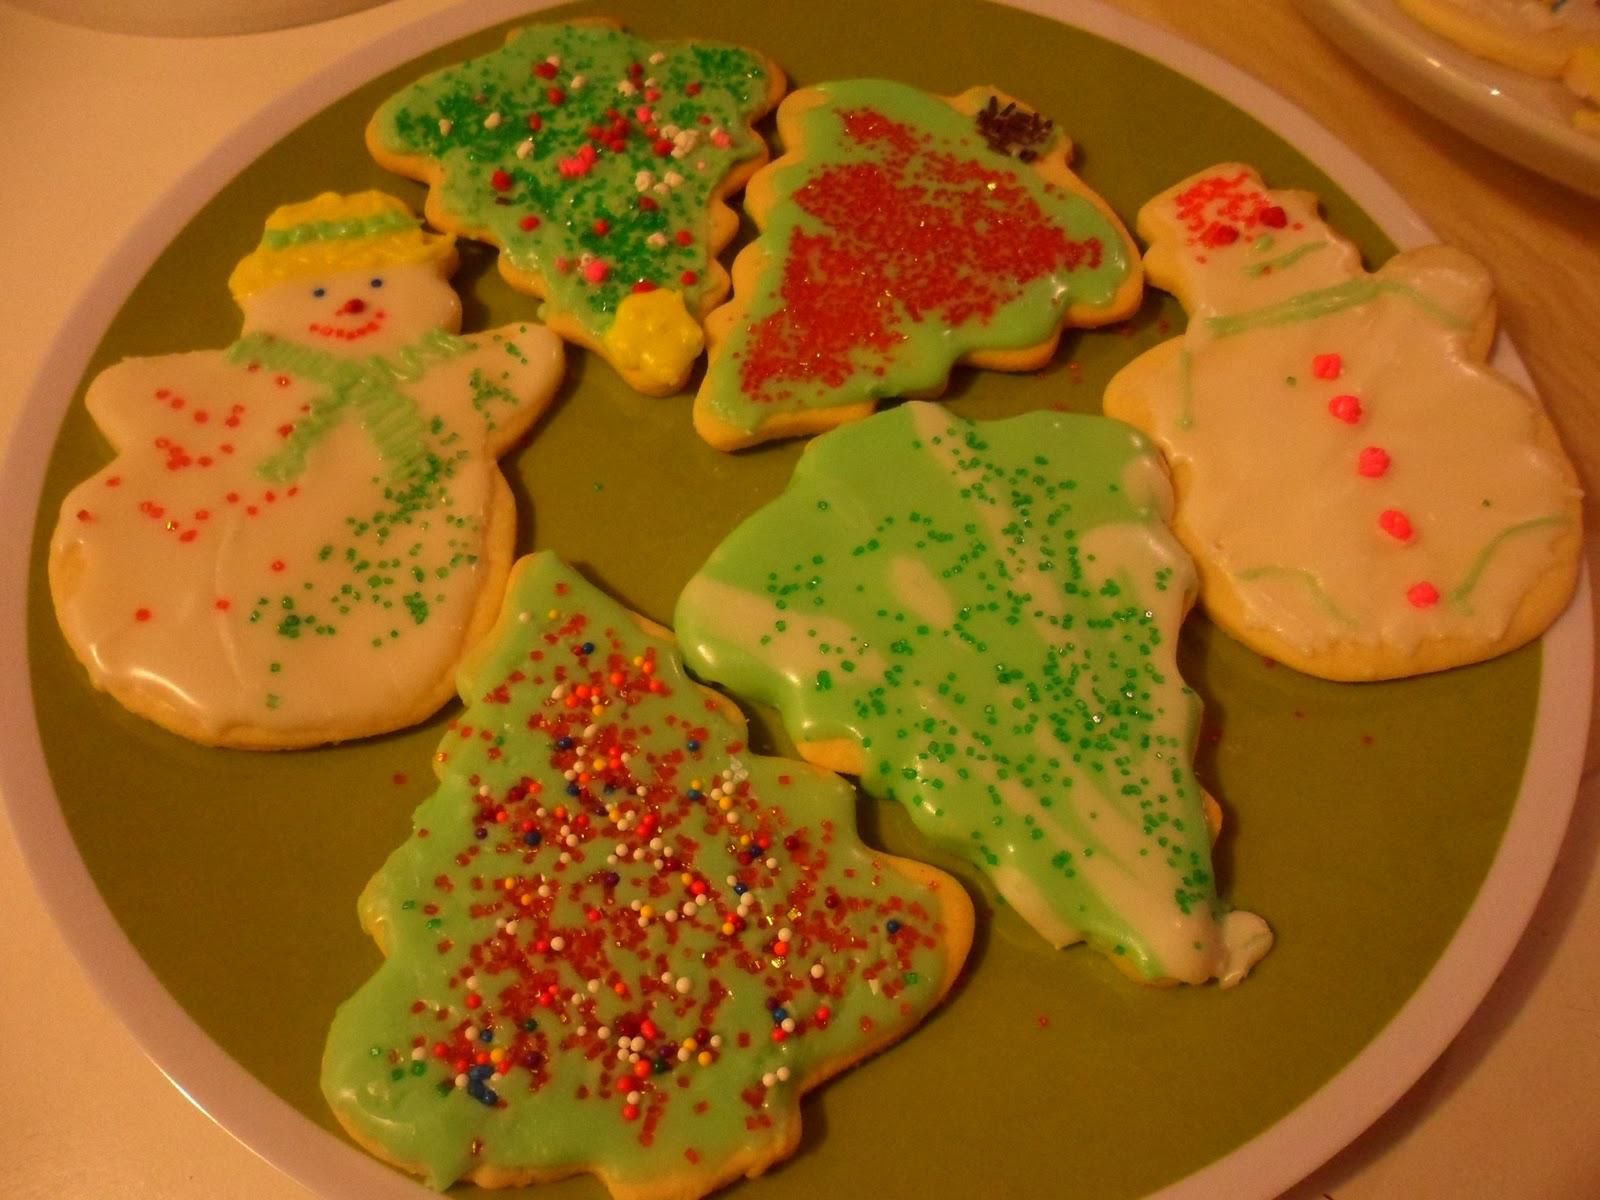 julkakor med glasyr